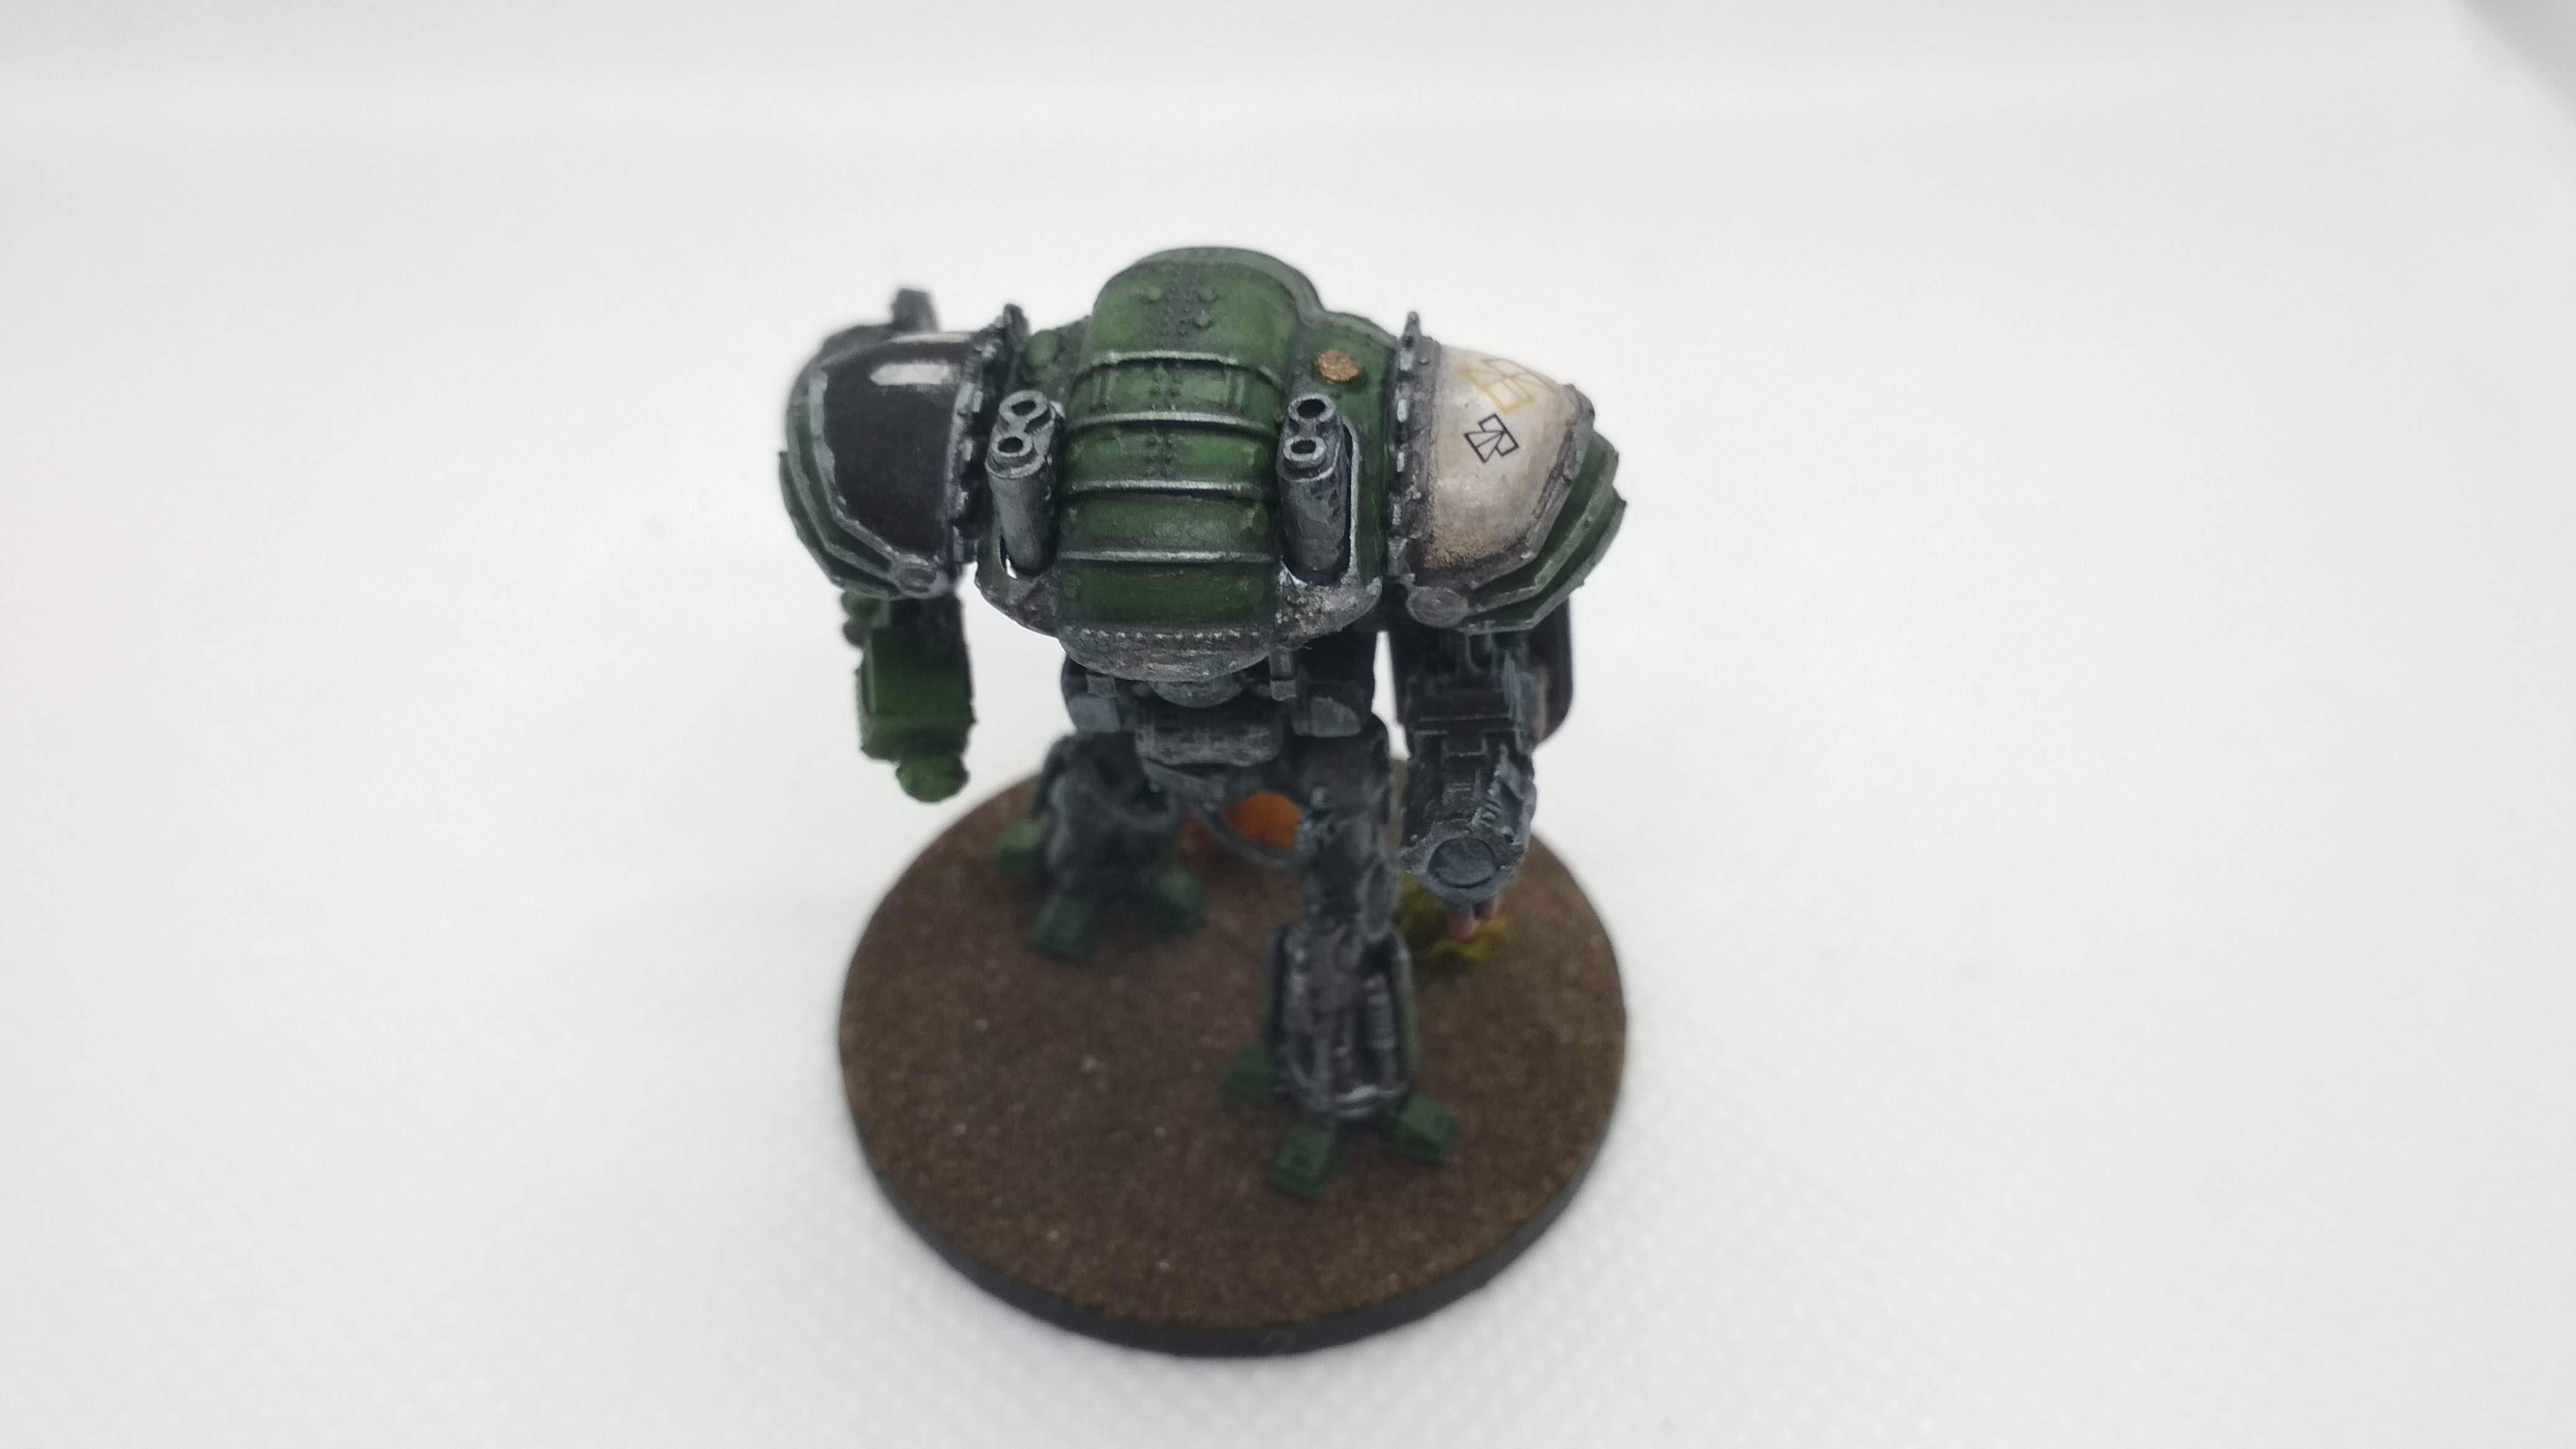 Knight magaera rear detail